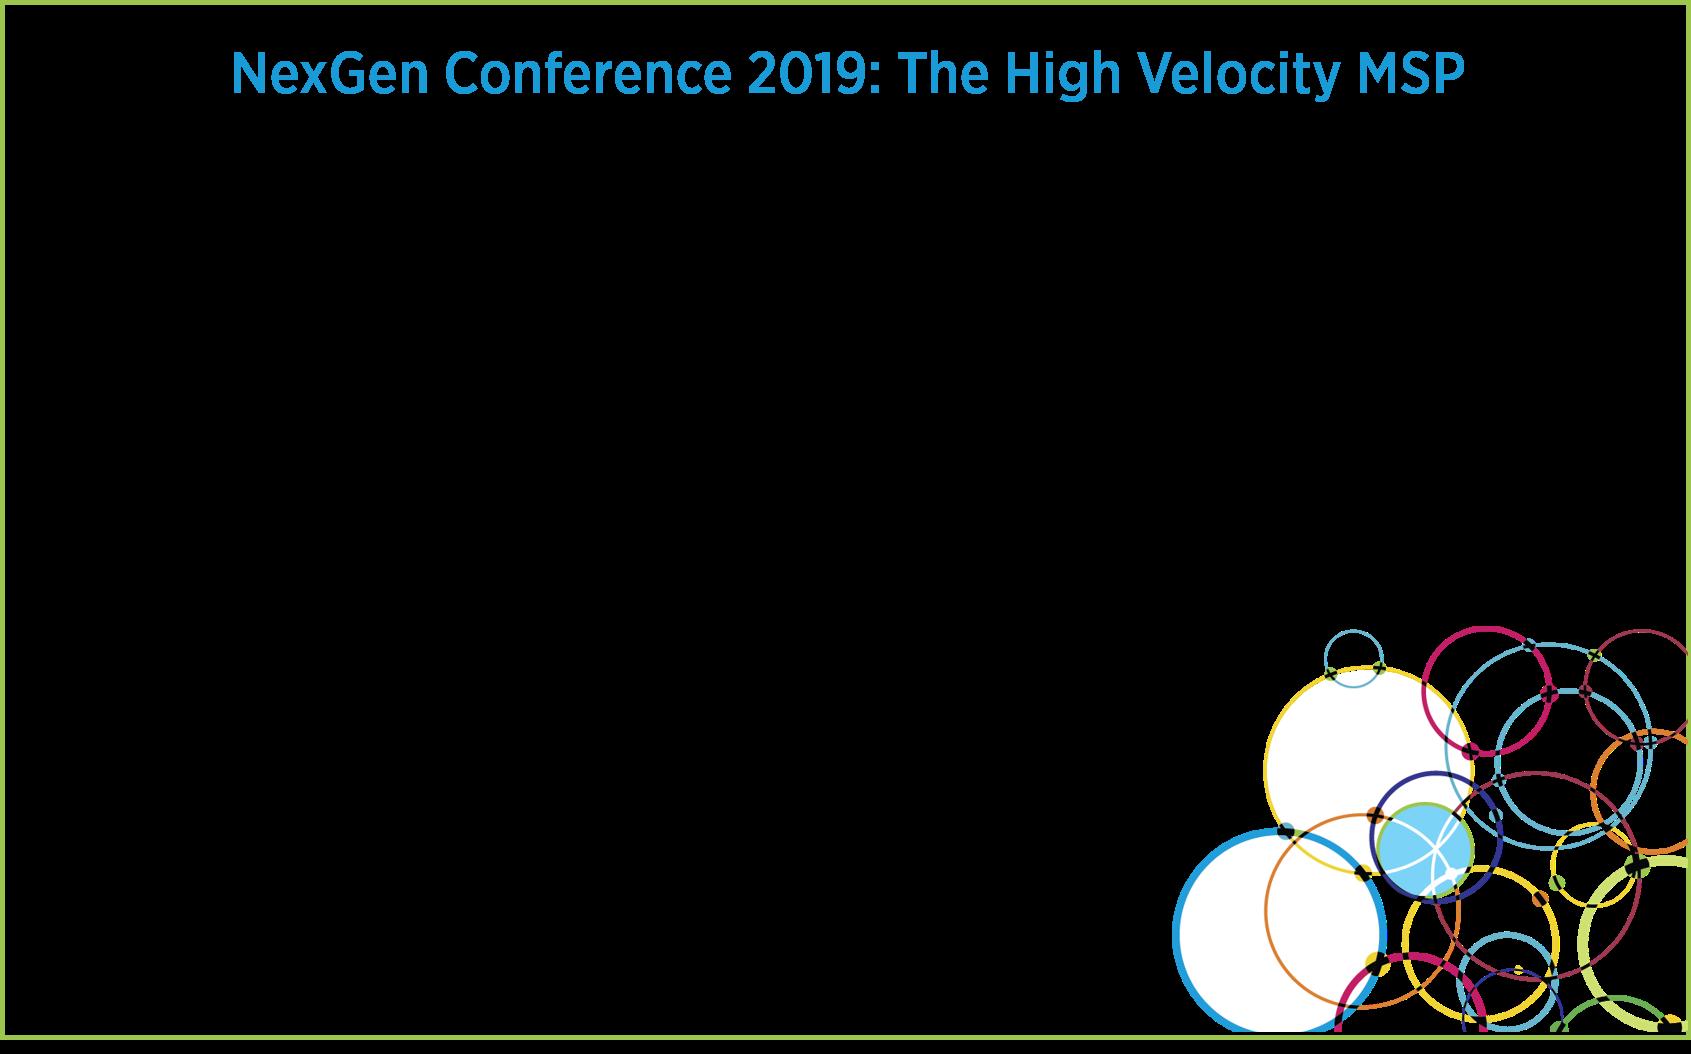 NexGen 2019 Conference